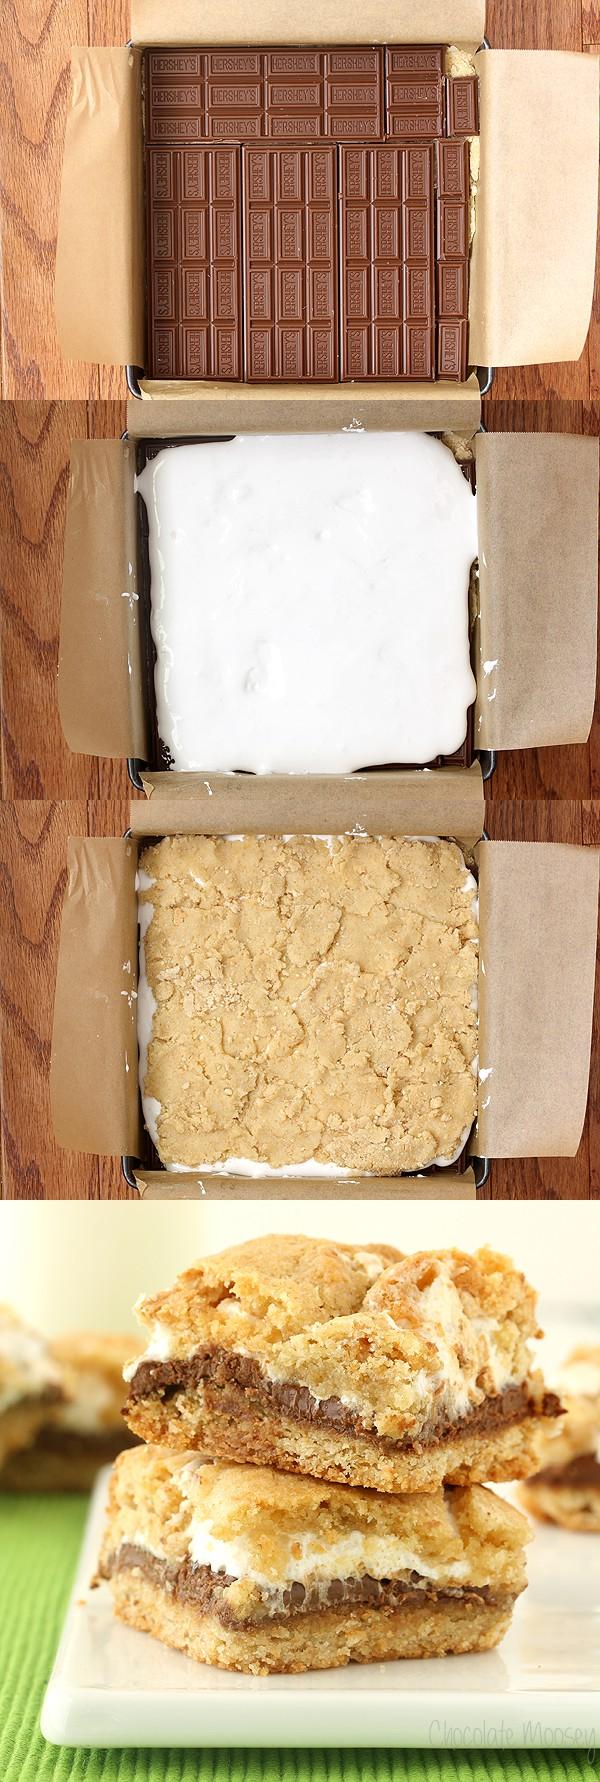 Assembling S'mores Cookie Crumb Bars